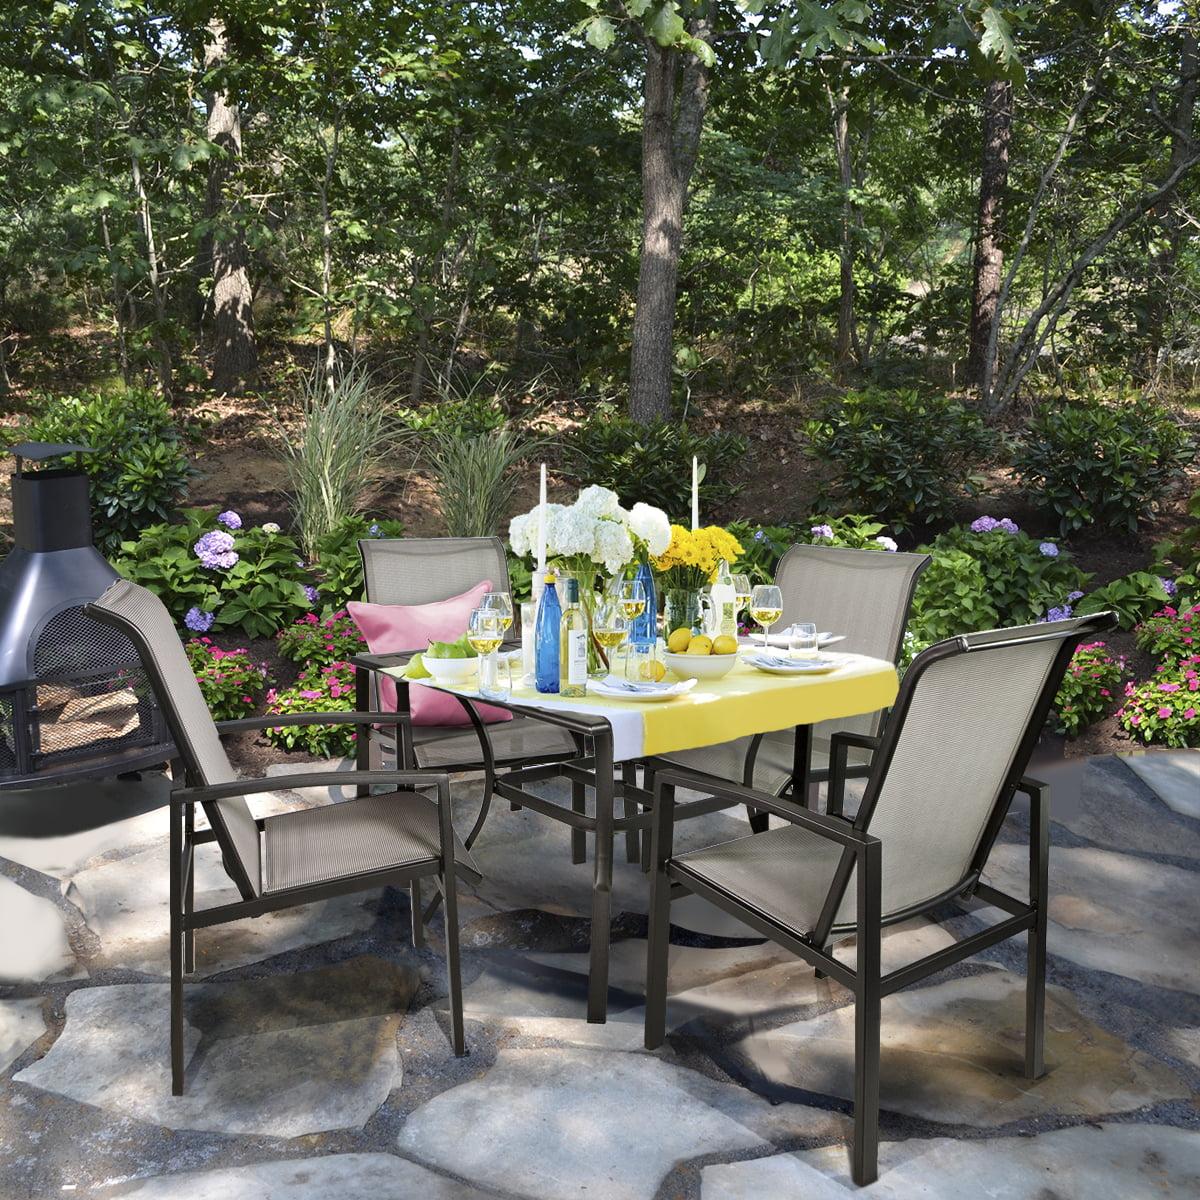 5pc outdoor patio table chair set mesh dining set gray walmart com